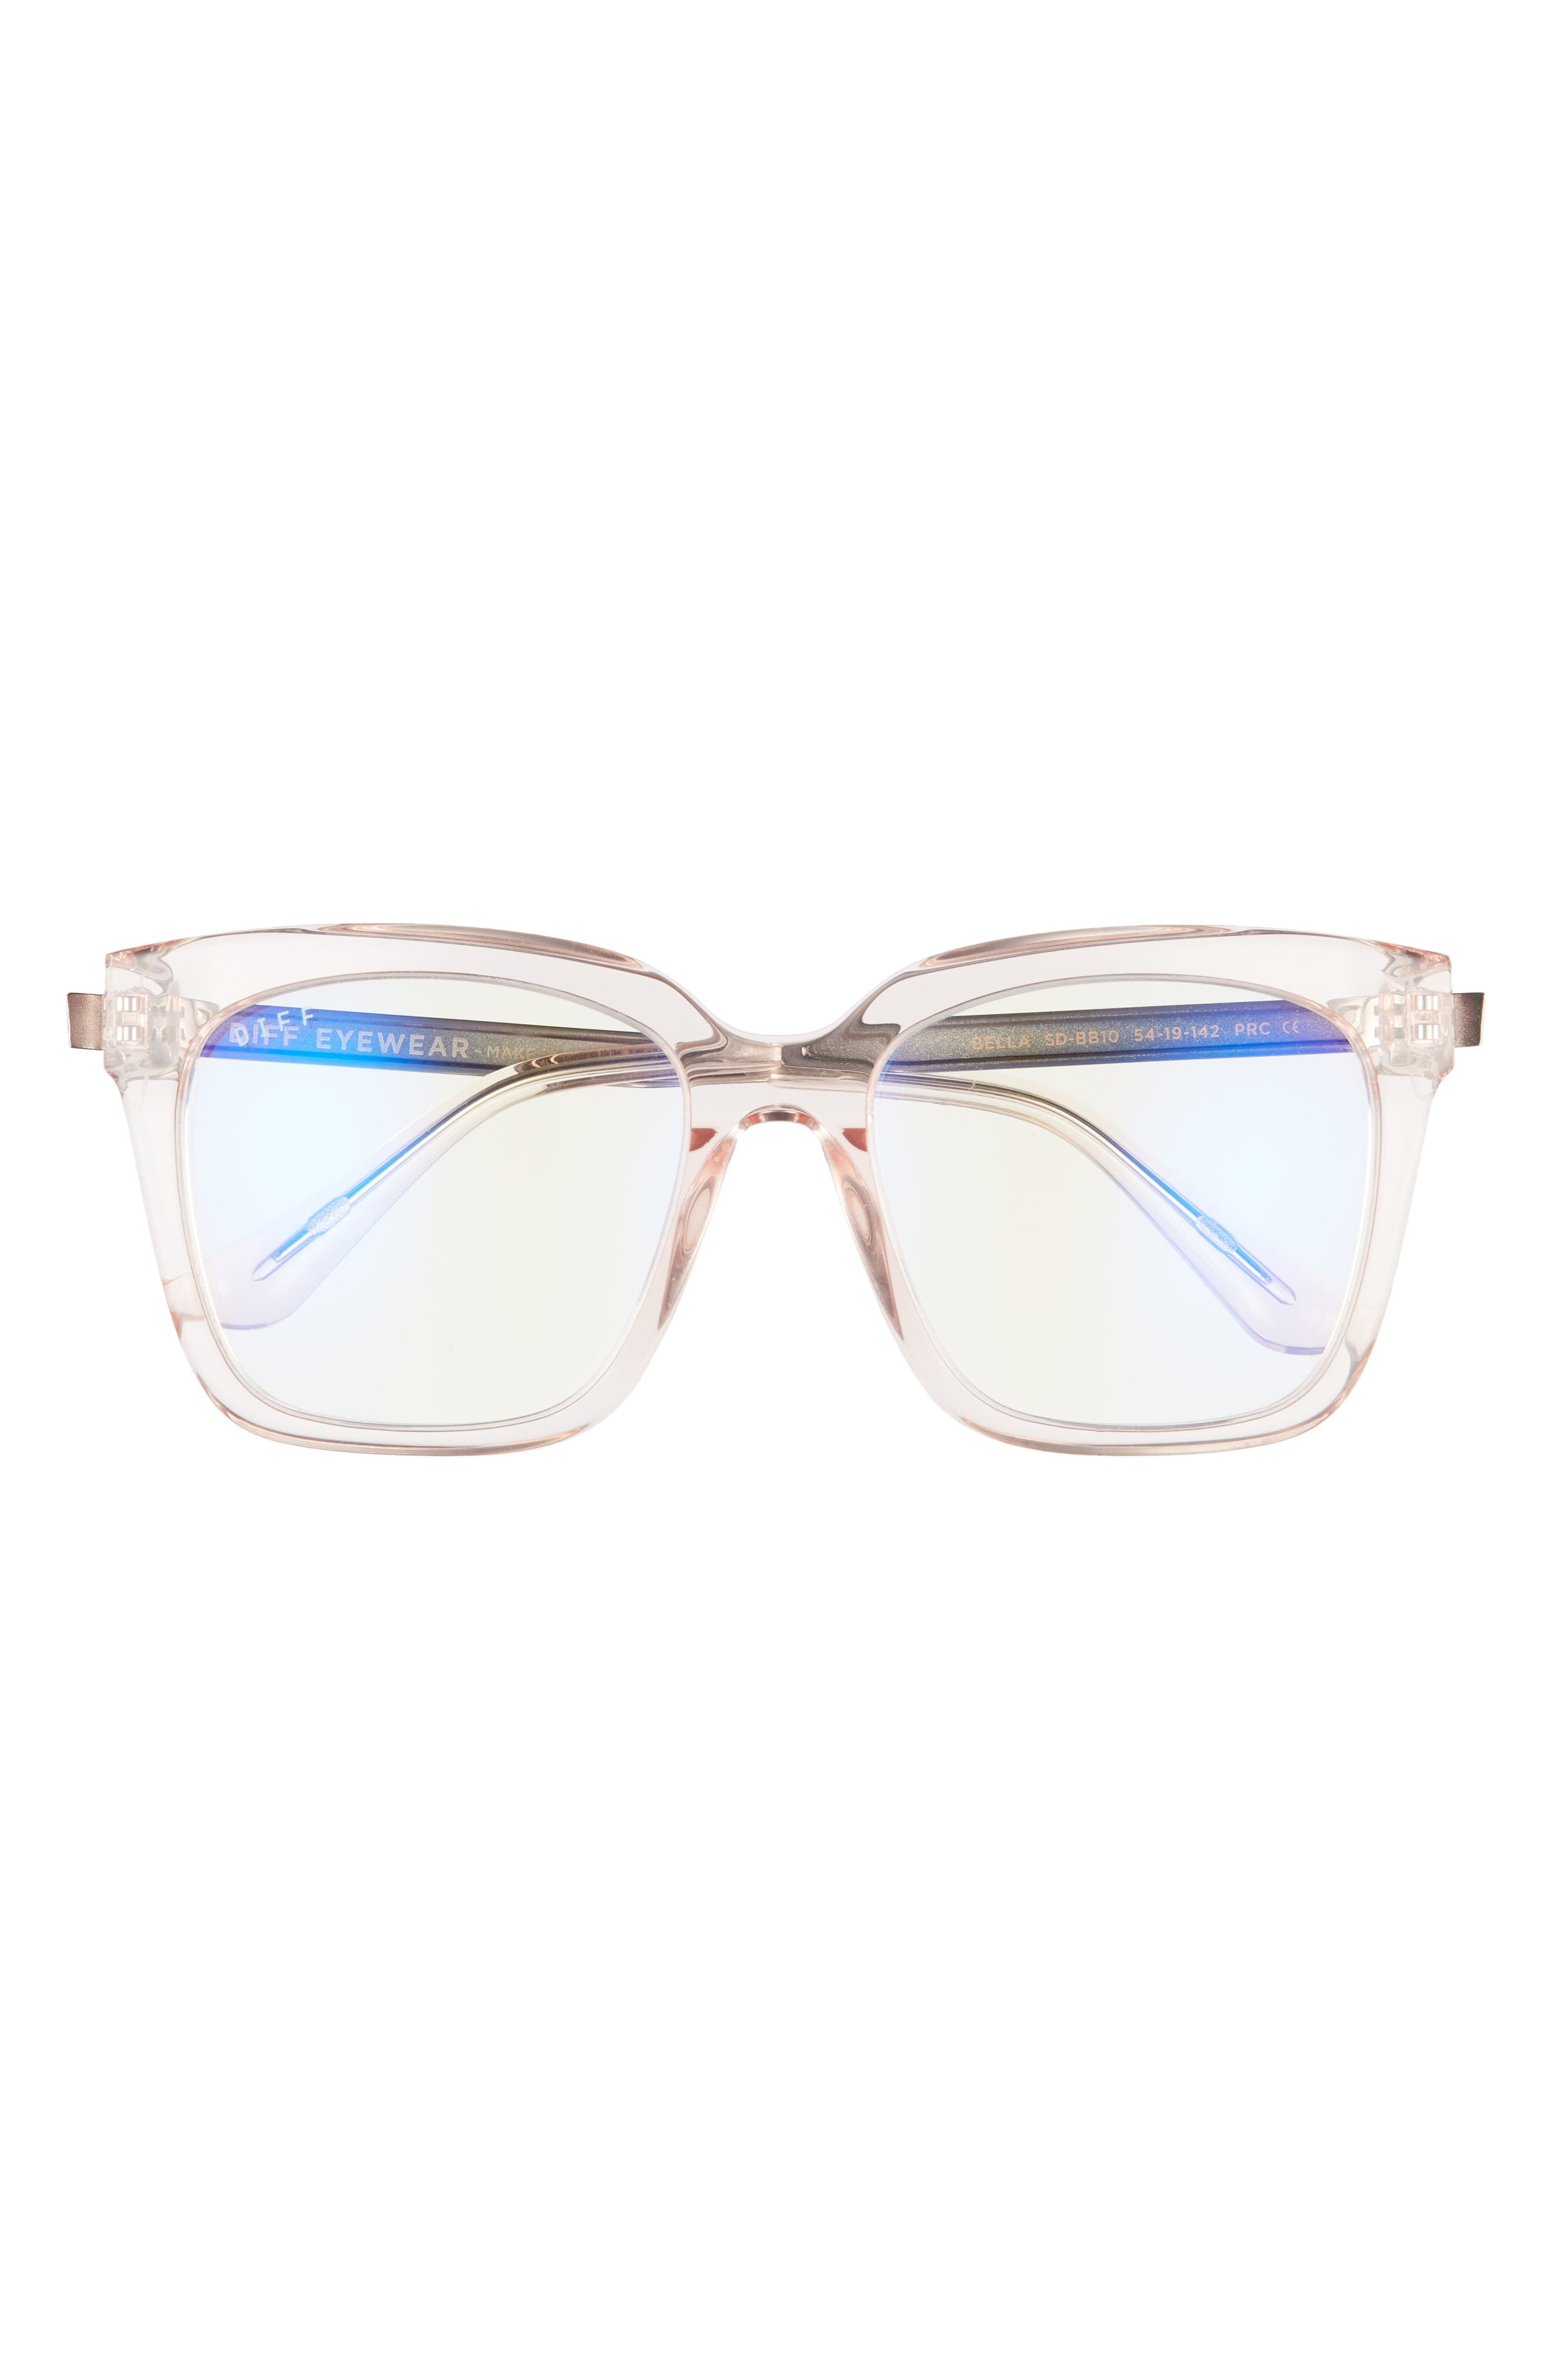 Sawyer 54mm Square Blue Light Blocking Glasses